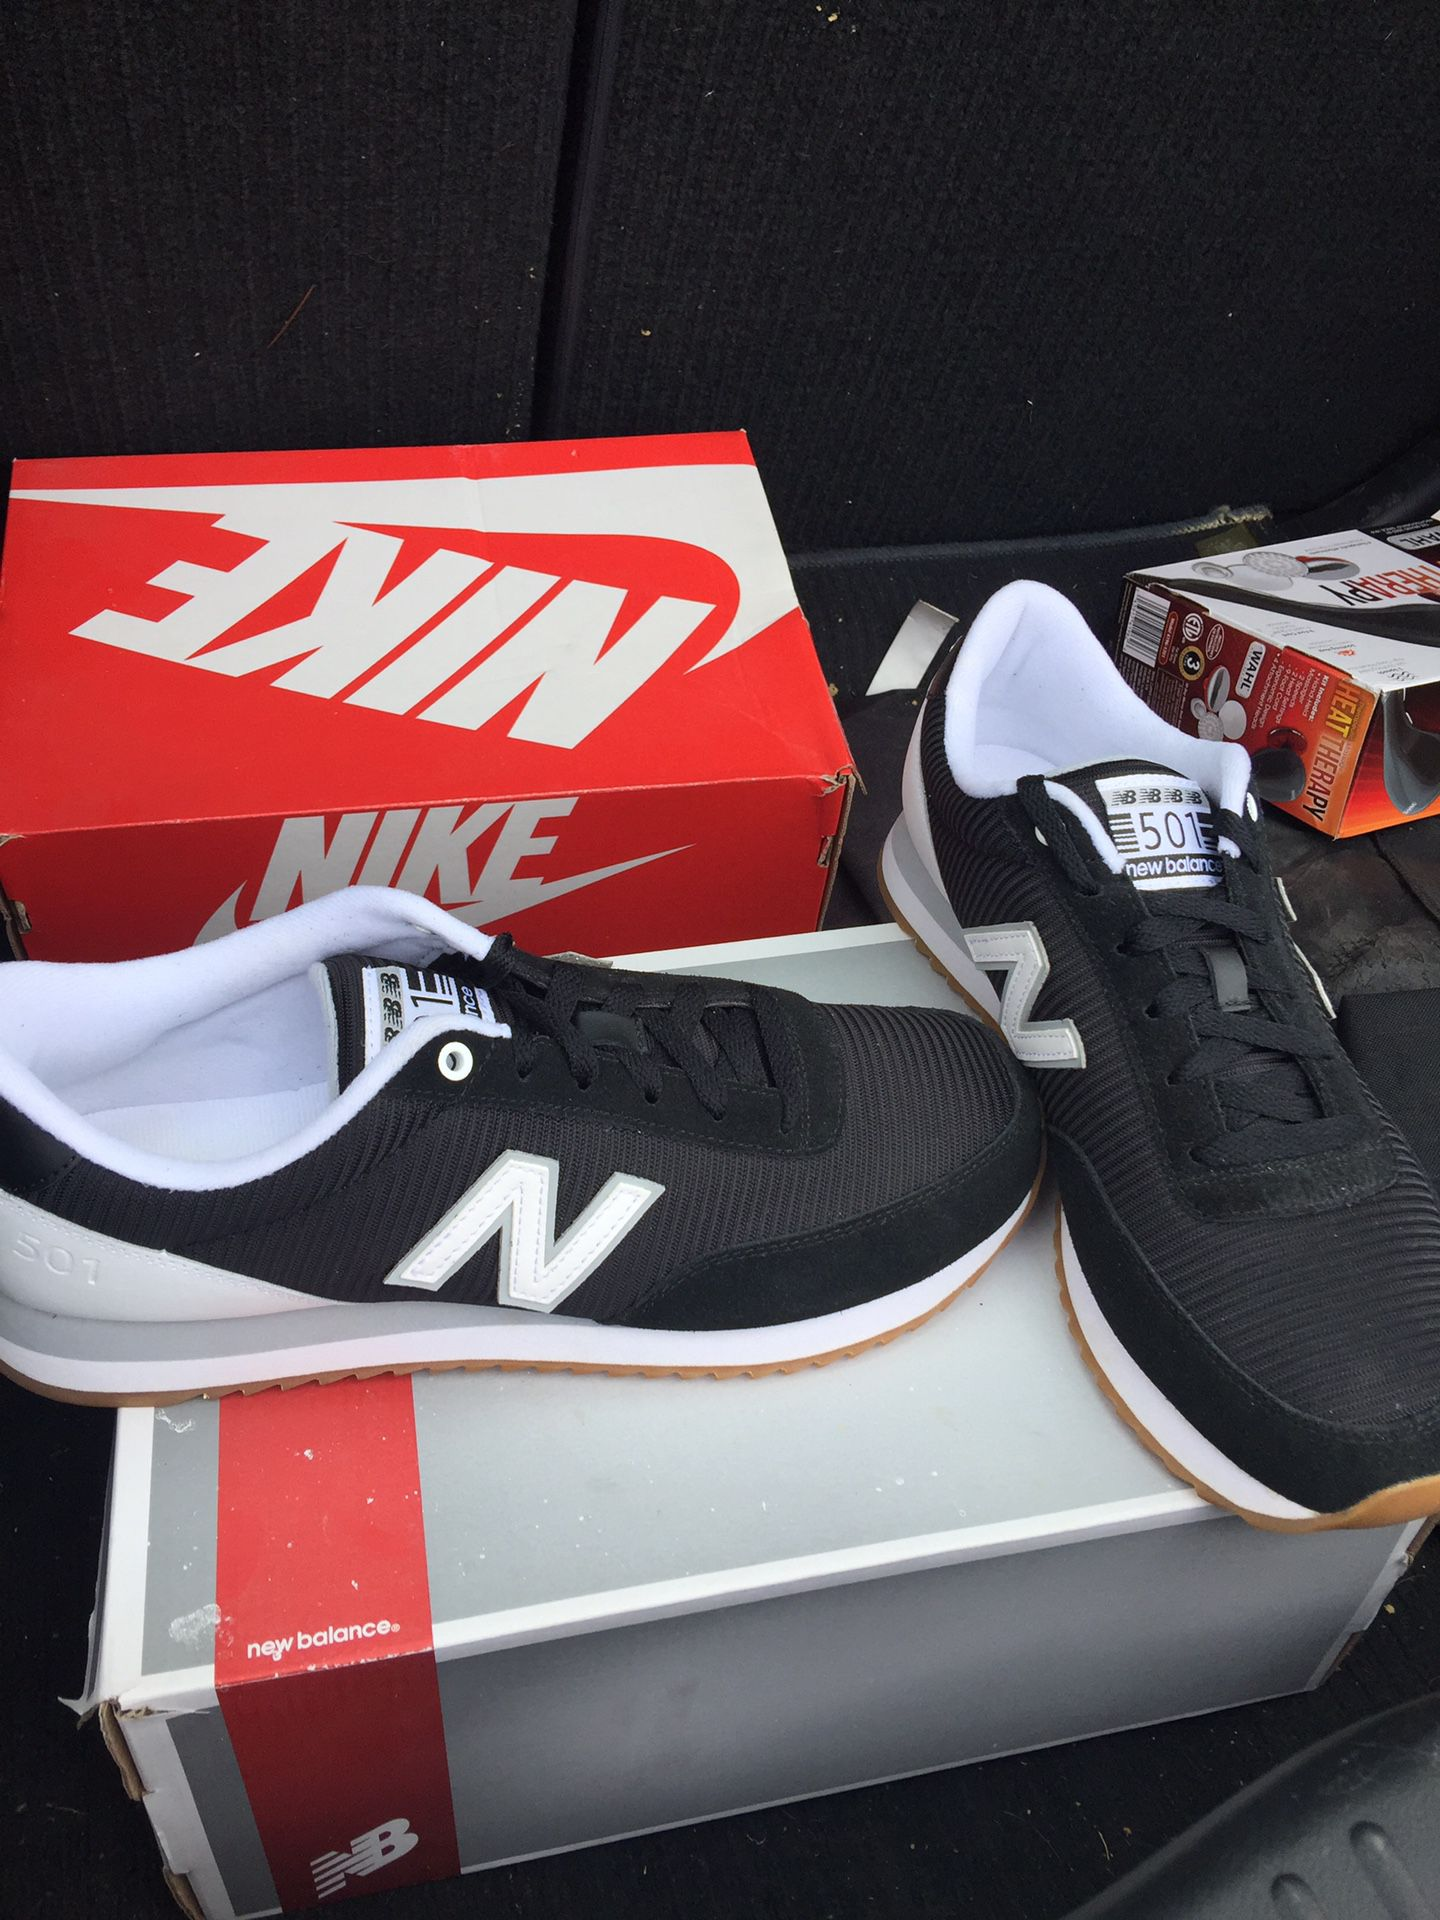 New Balance 501's